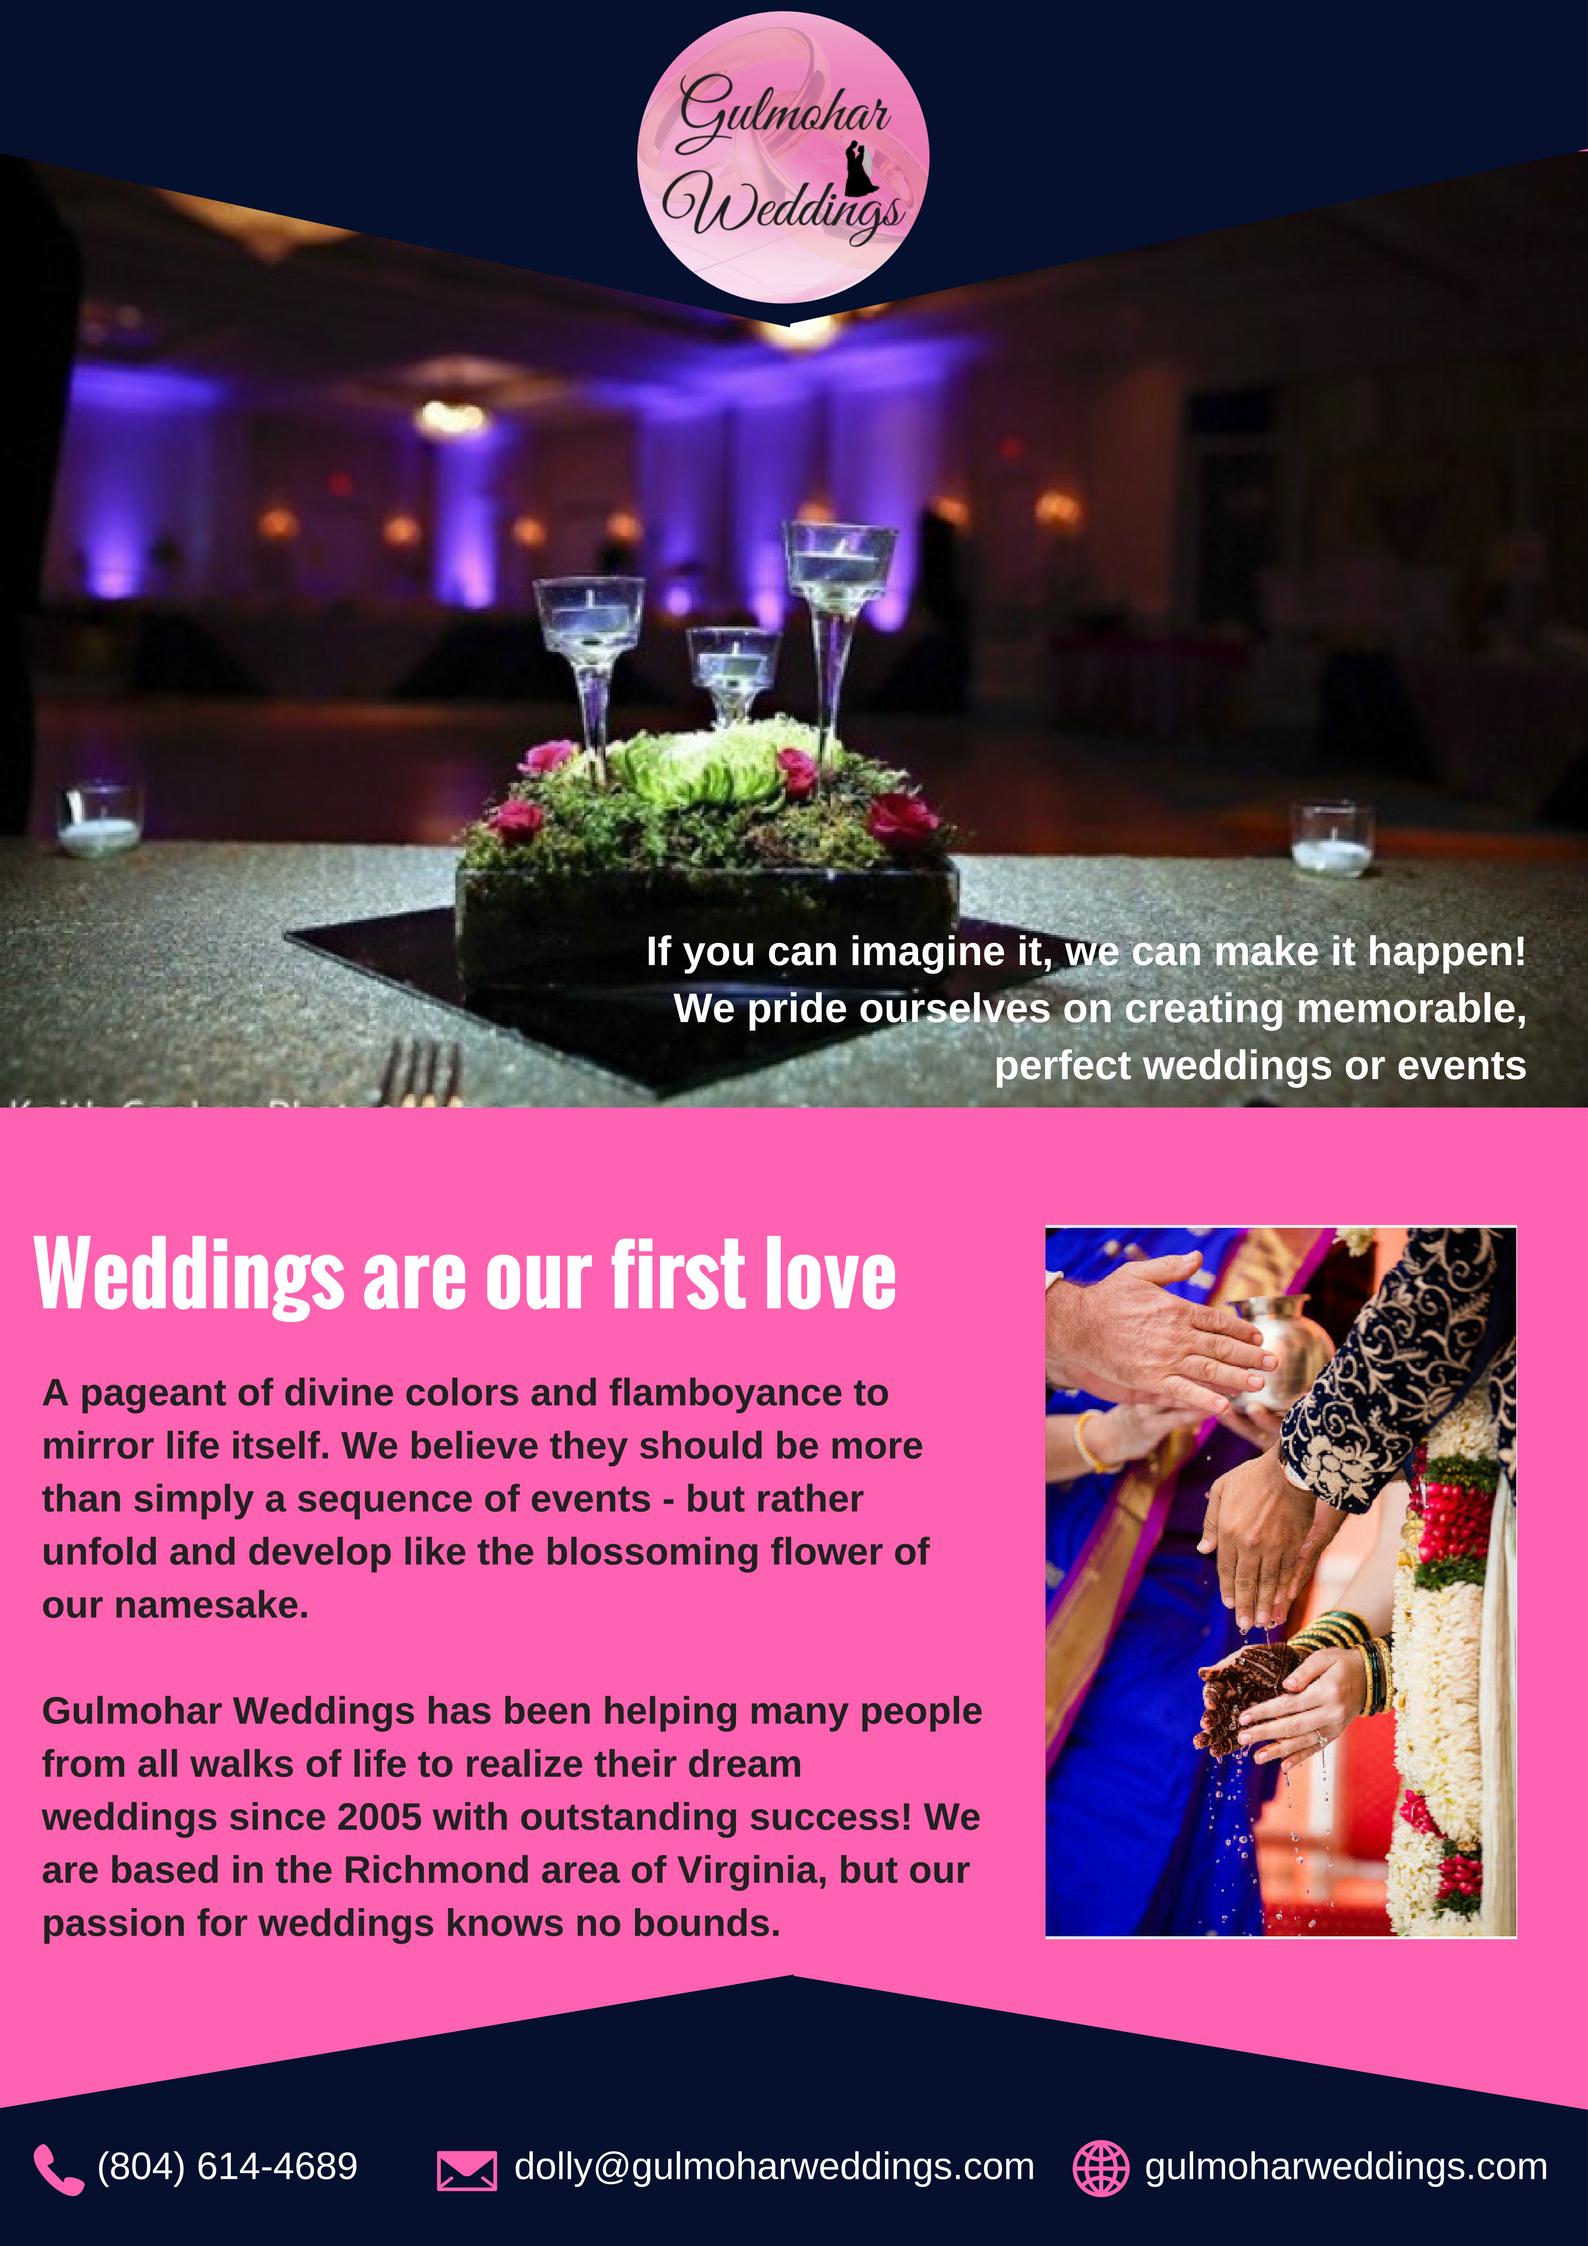 Indian Wedding Decorator In Richmond Va Indian Wedding Decorator In Virginia Beach Va Indian Wedding Decorato Asian Wedding Decor Perfect Wedding Asian Wedding